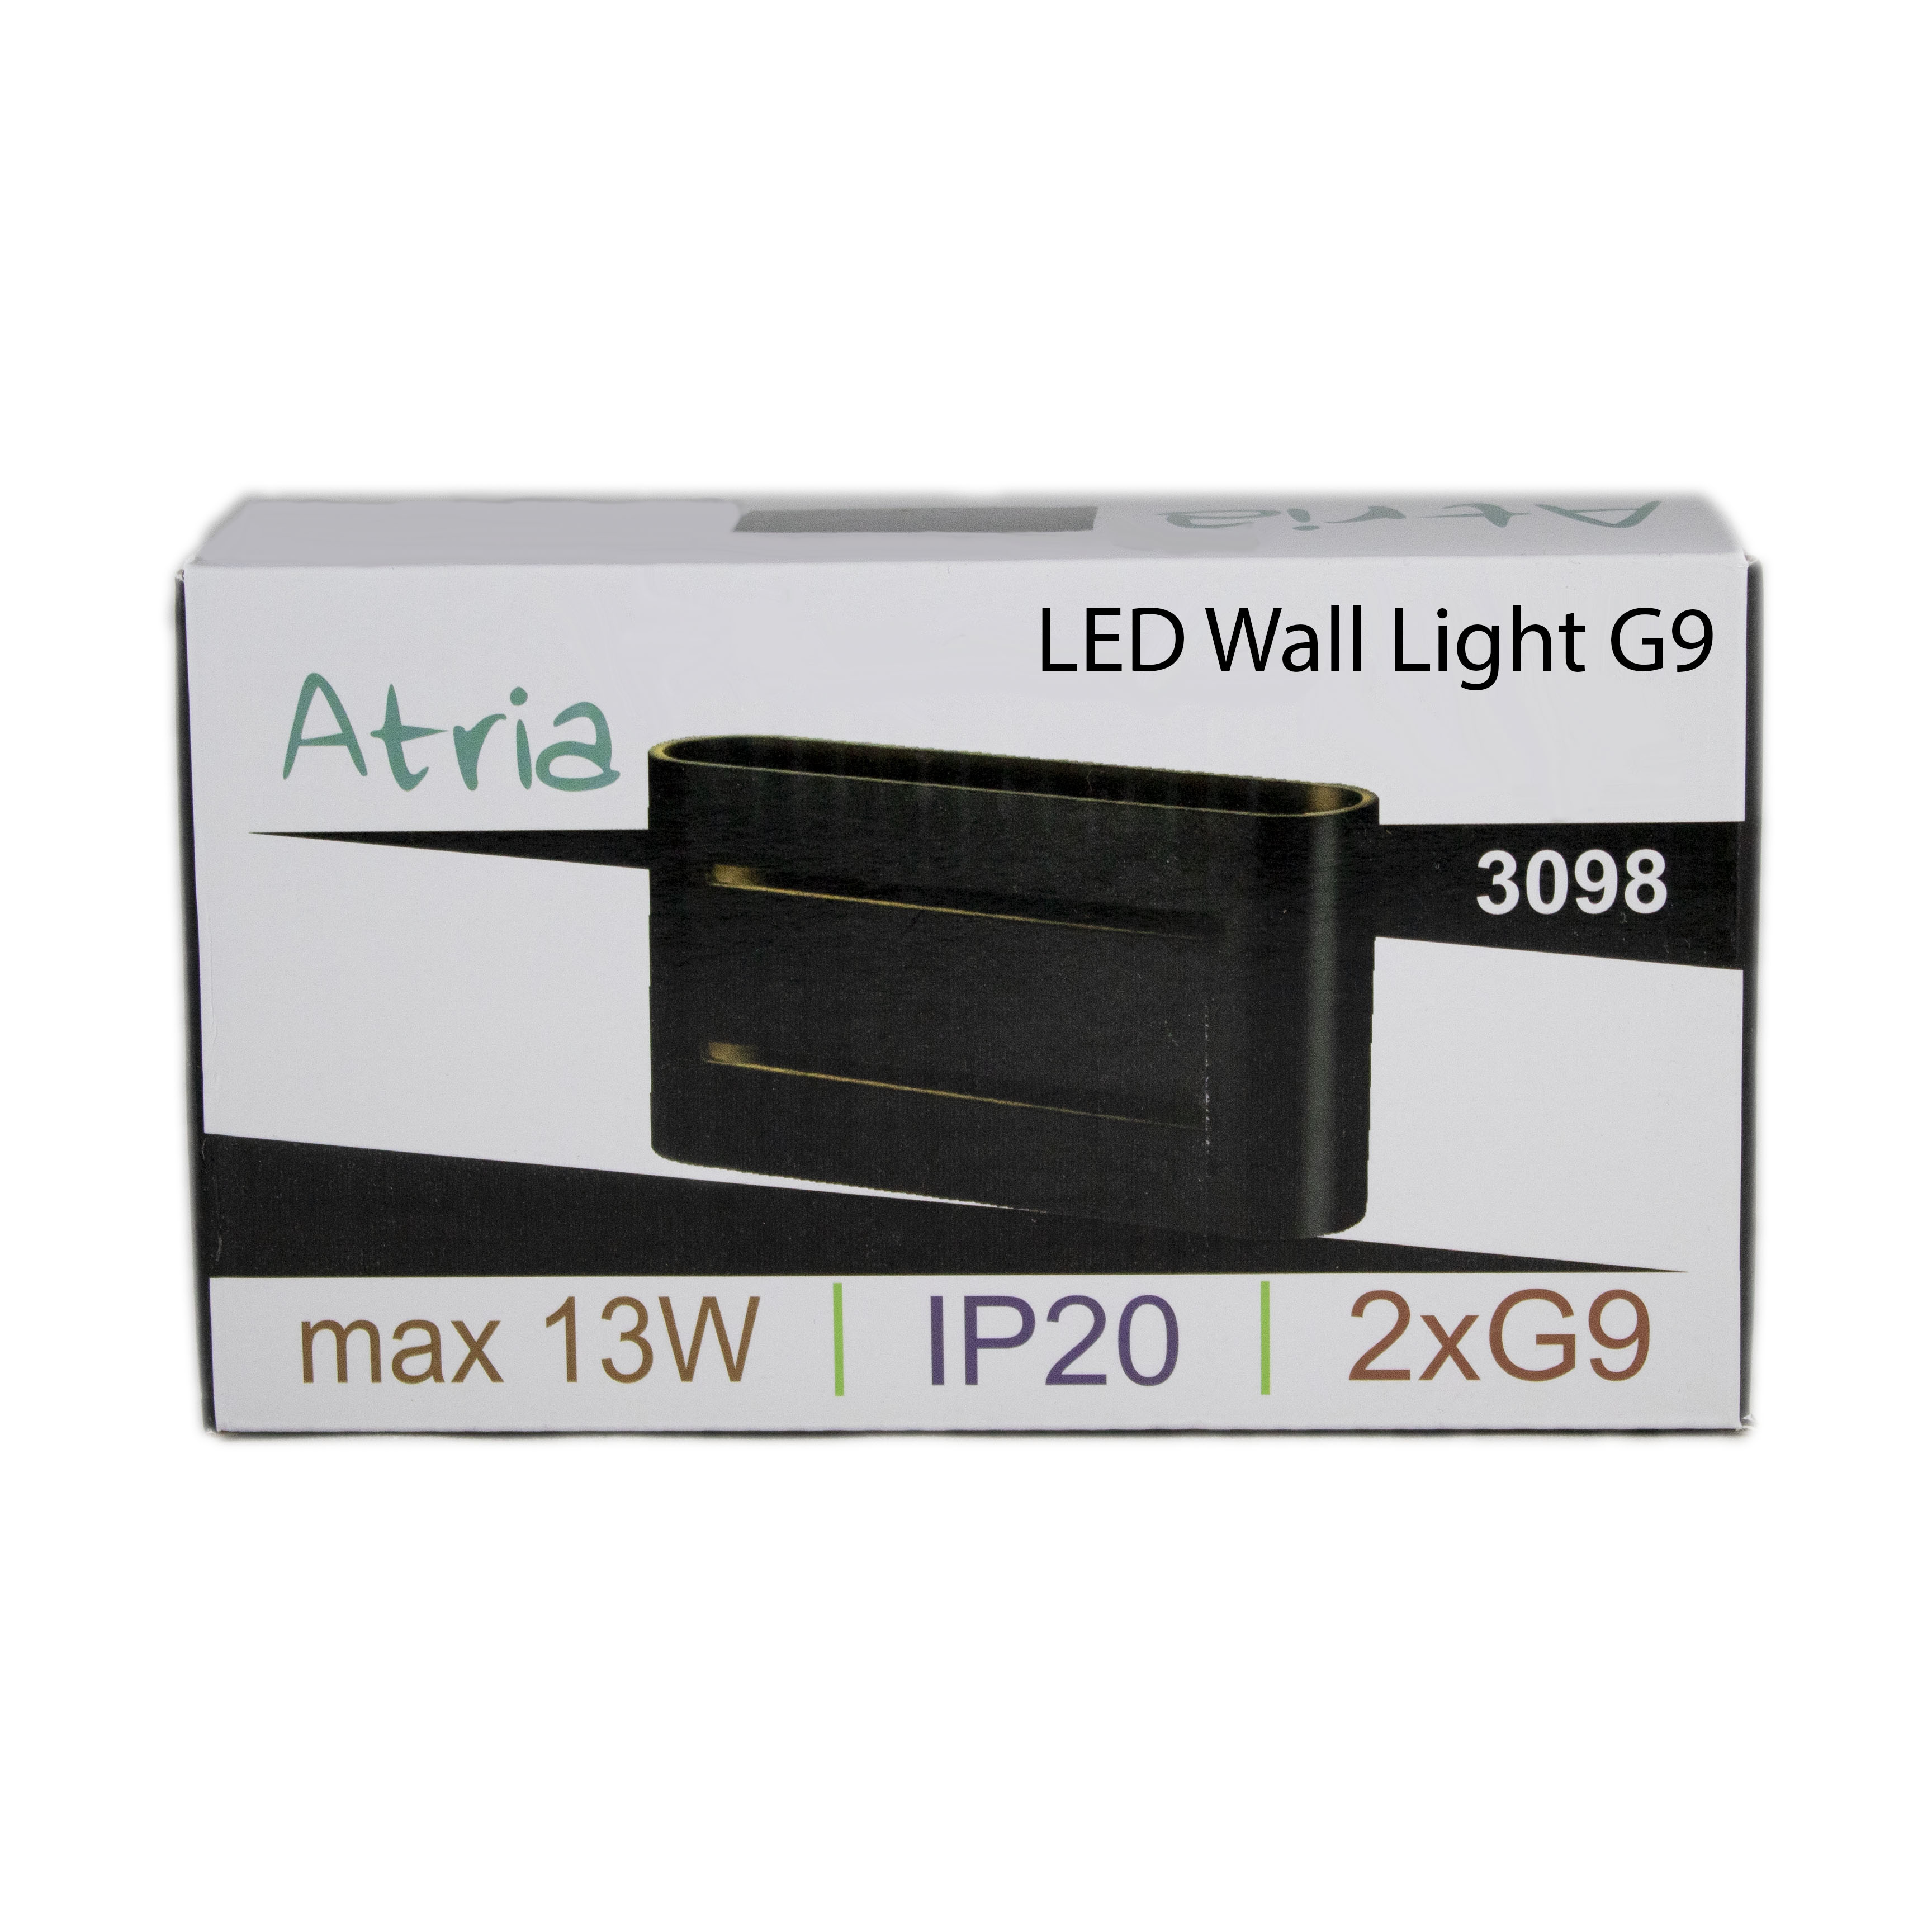 Led wandlamp zwart goud 2 keer G9 fitting - ip20 - verpakking